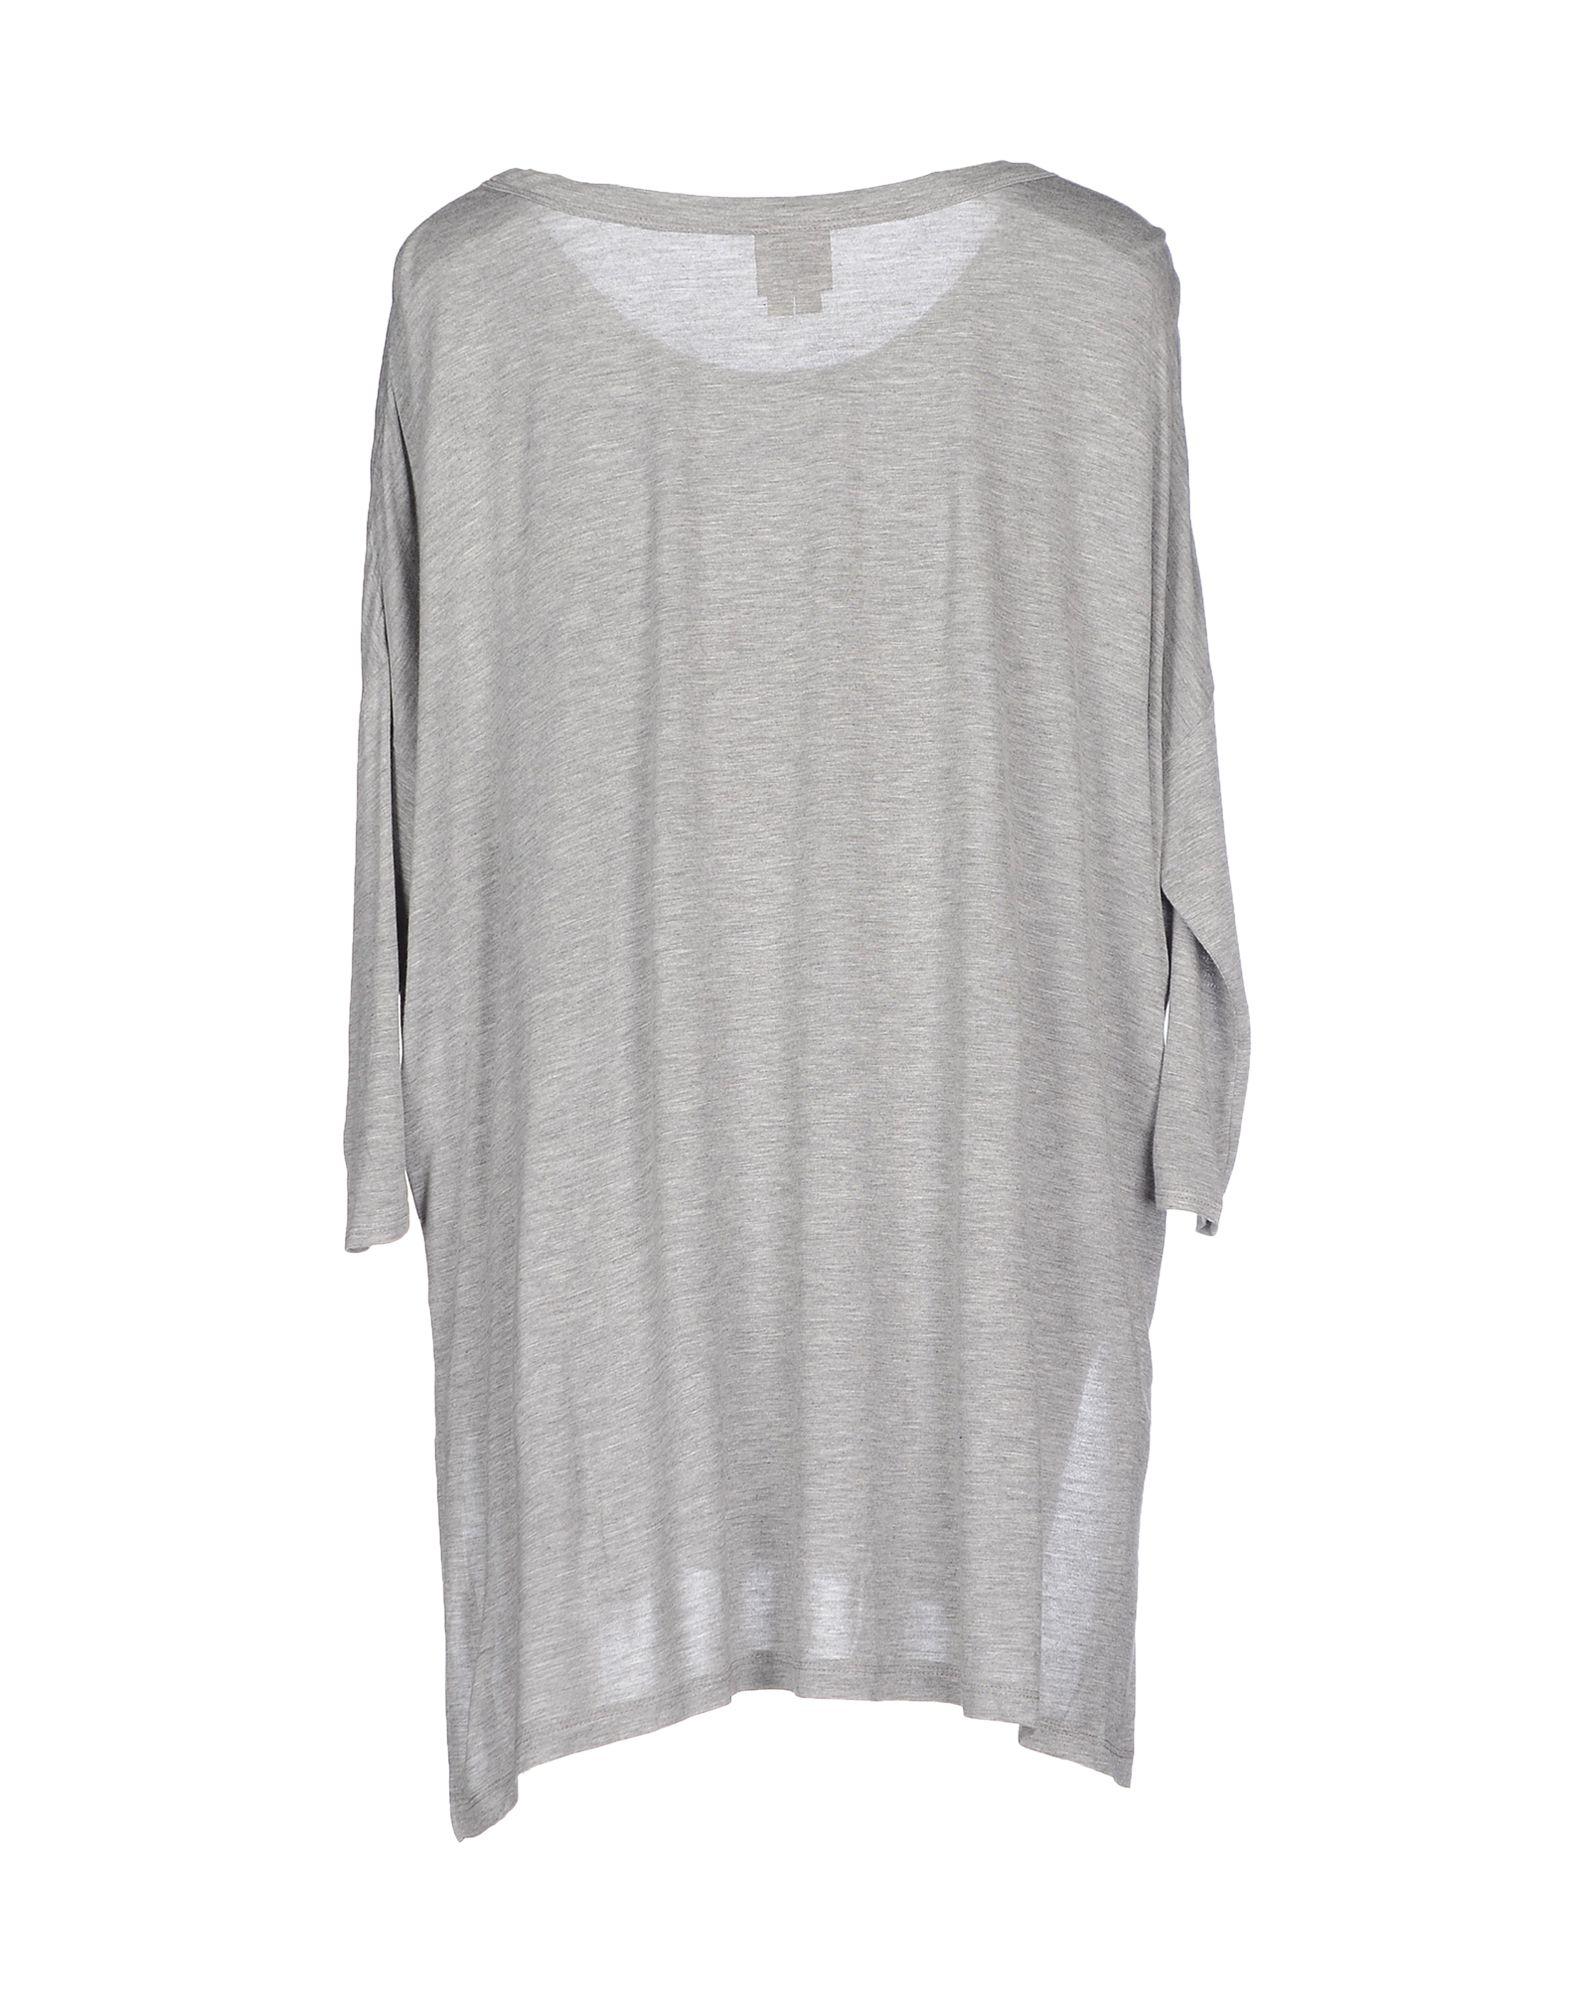 Lyst haute hippie t shirt in gray for Hippie t shirts australia